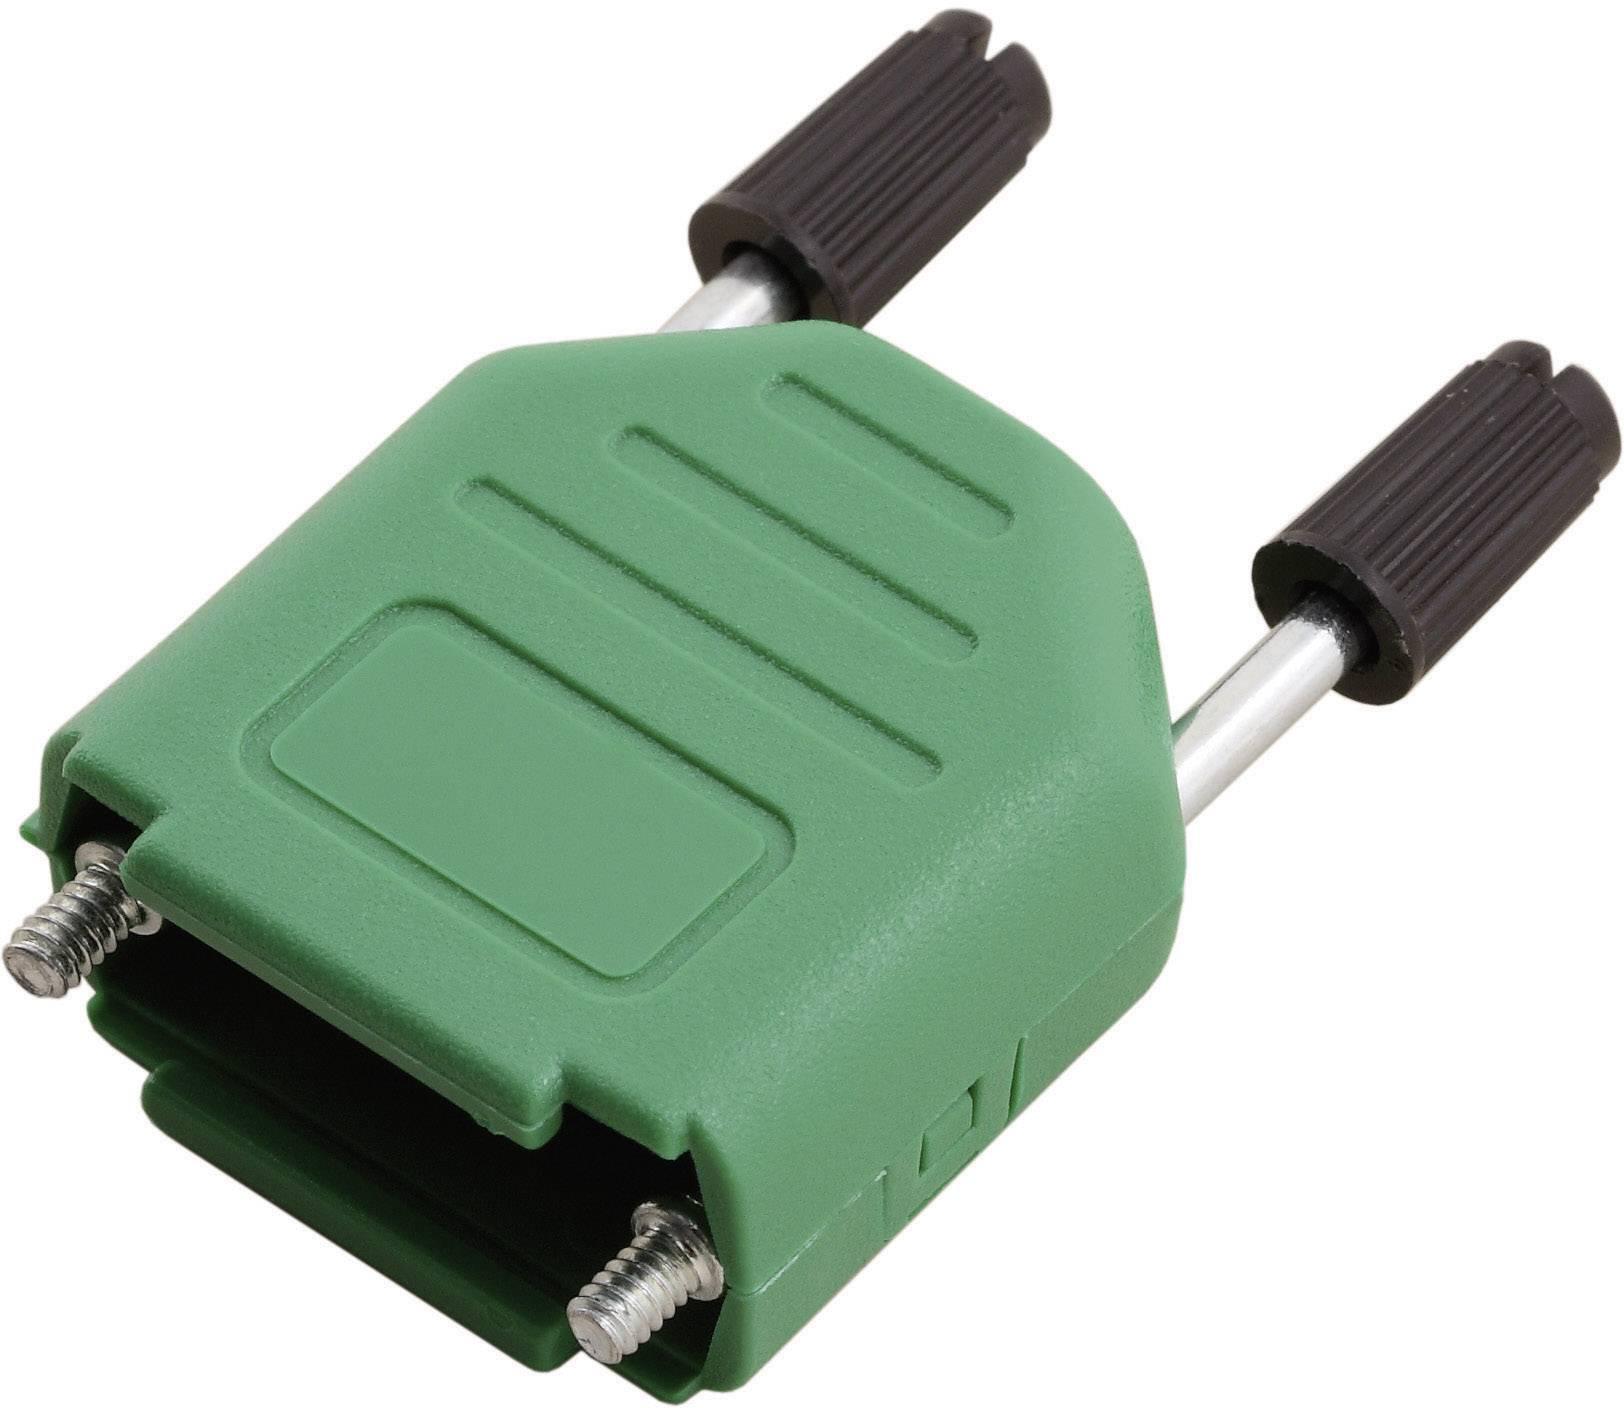 D-SUB púzdro MH Connectors MHDPPK09-G-K 6353-0106-01, Počet pinov: 9, plast, 180 °, zelená, 1 ks